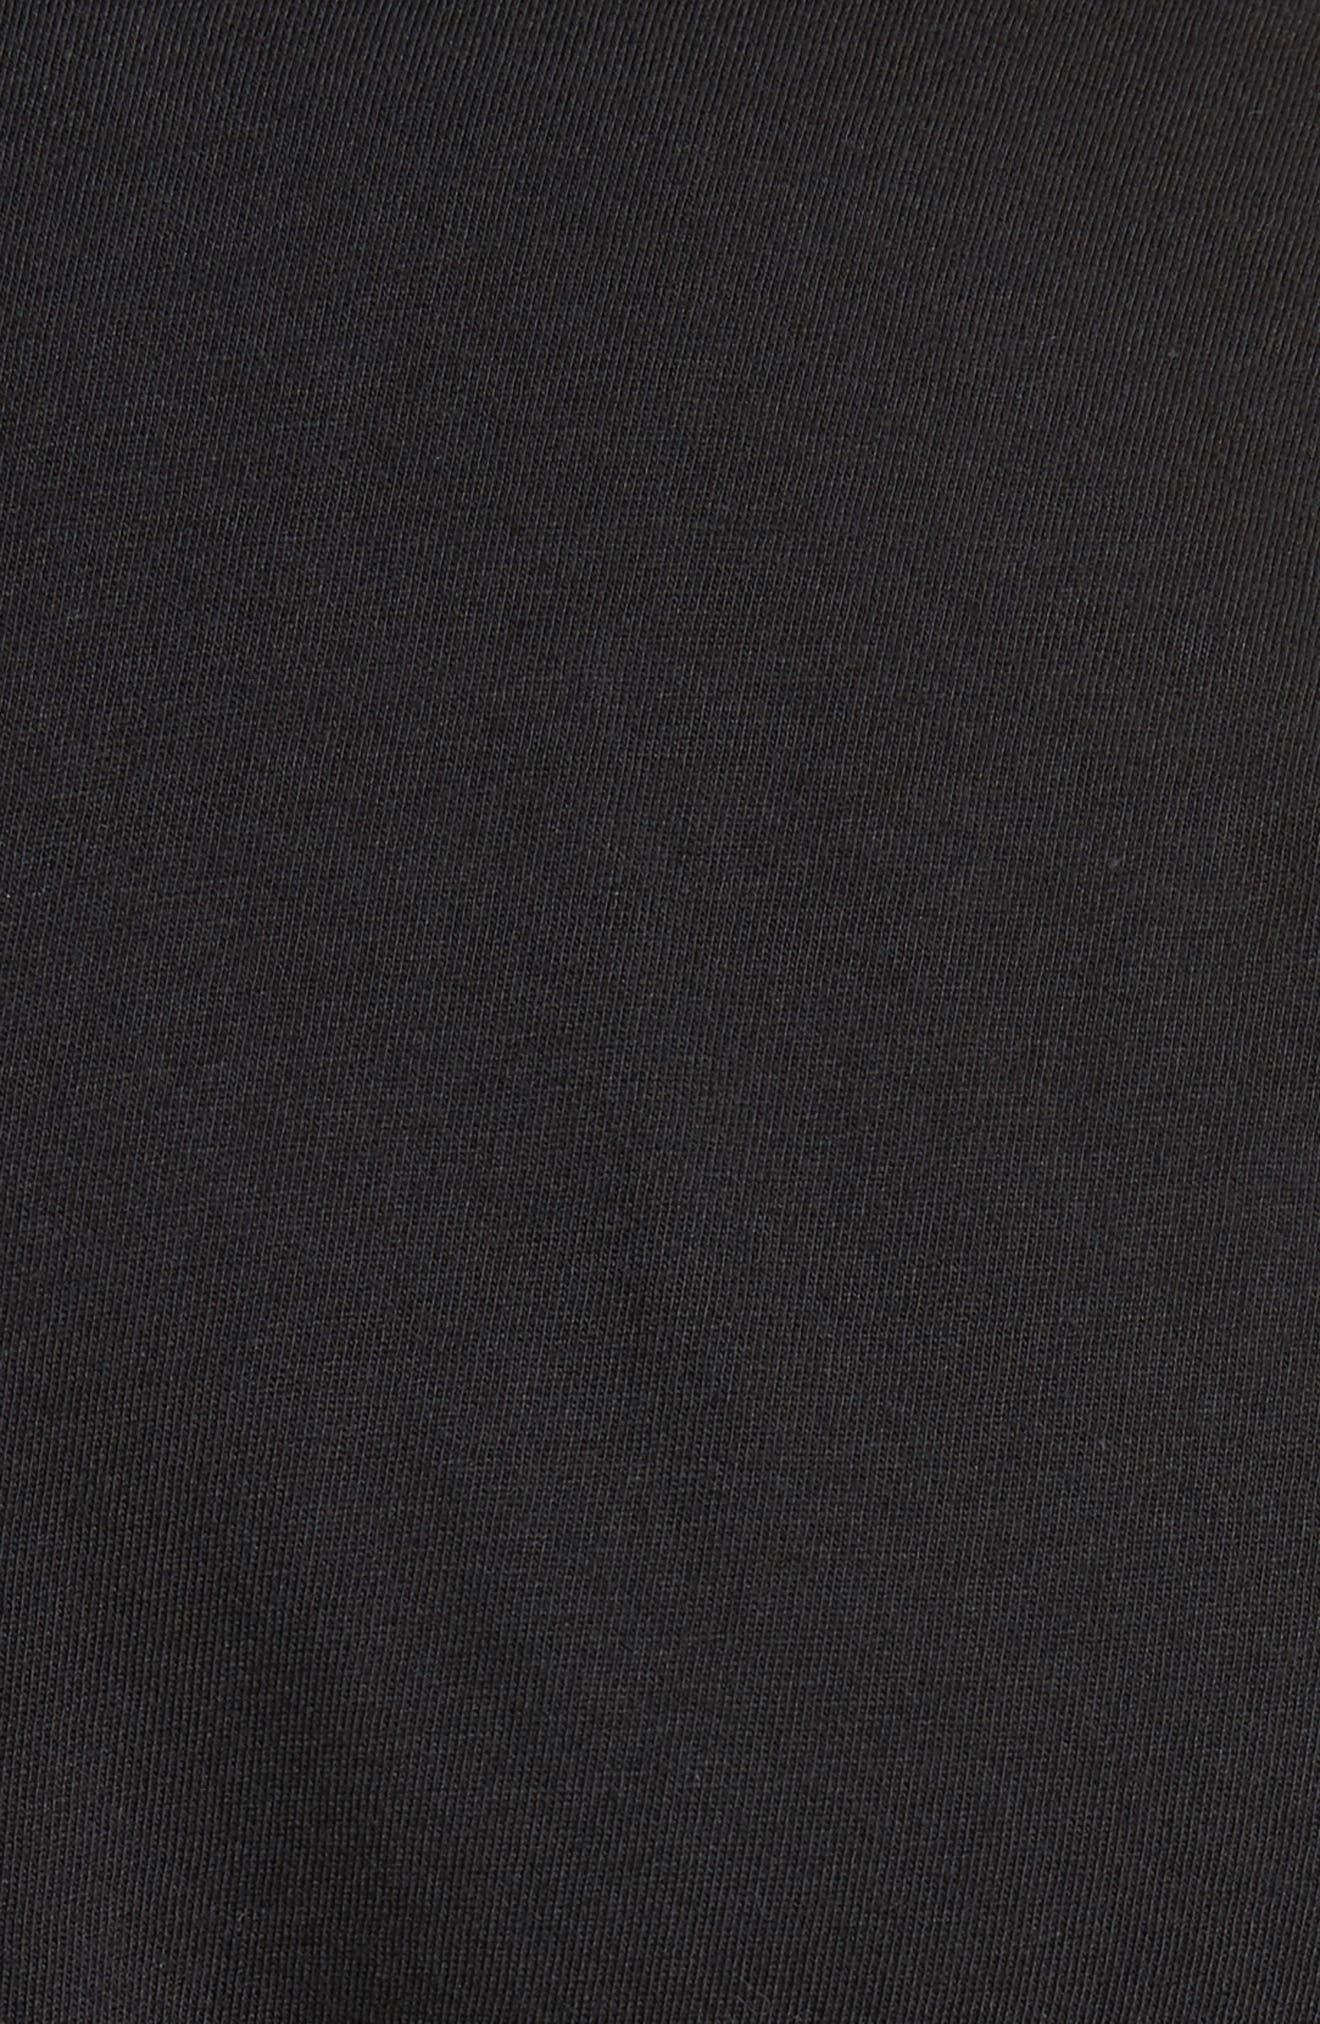 Sunset Graphic Long Sleeve T-Shirt,                             Alternate thumbnail 5, color,                             Black